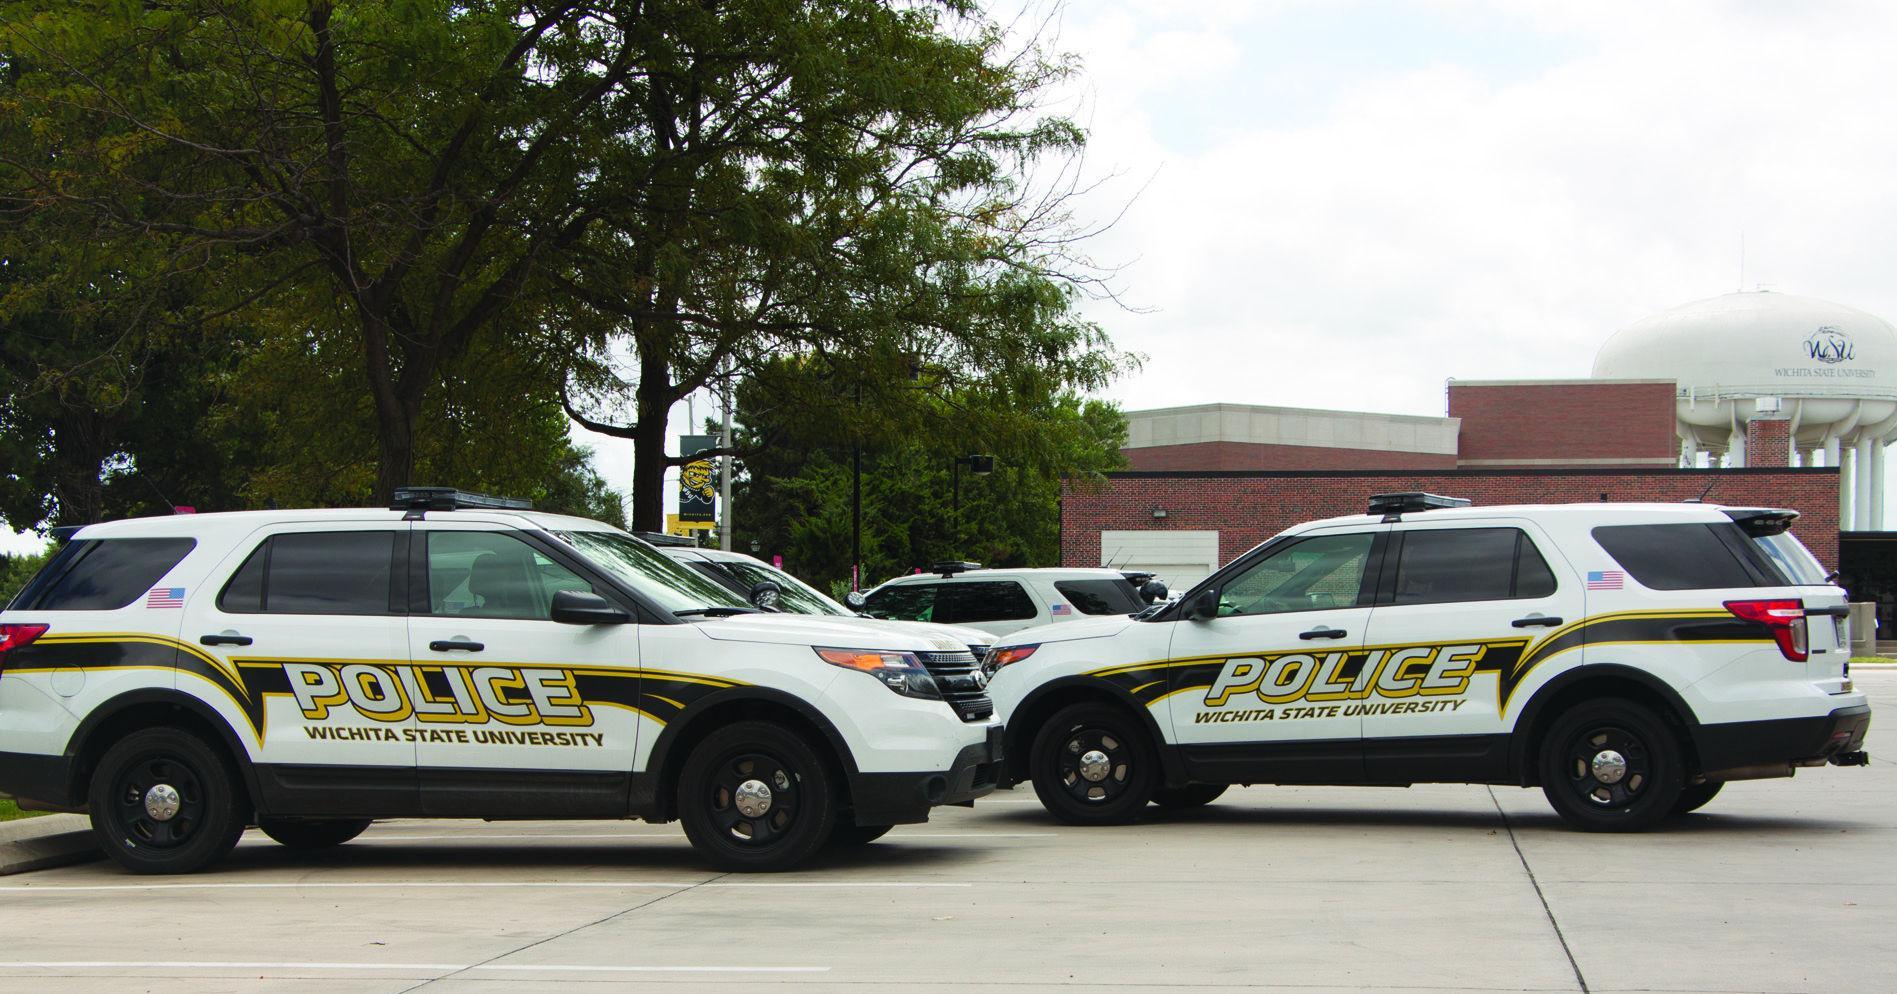 File photo, university police